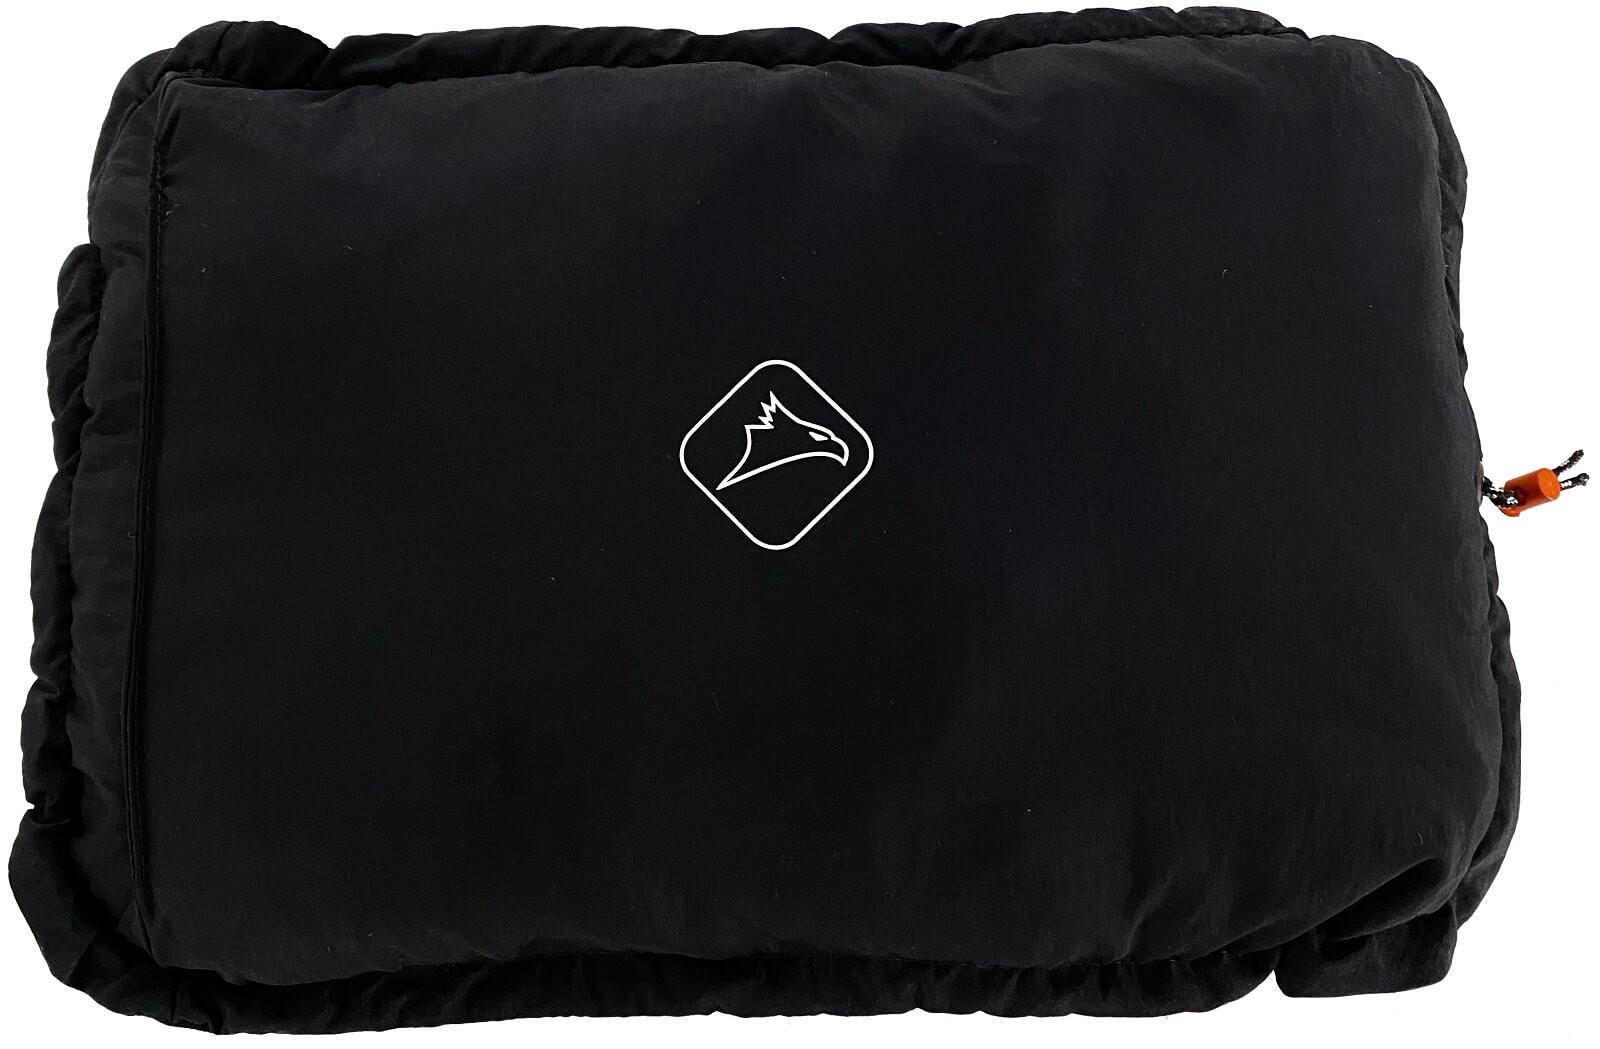 Travesseiro Compacto Magic Trip Conquista